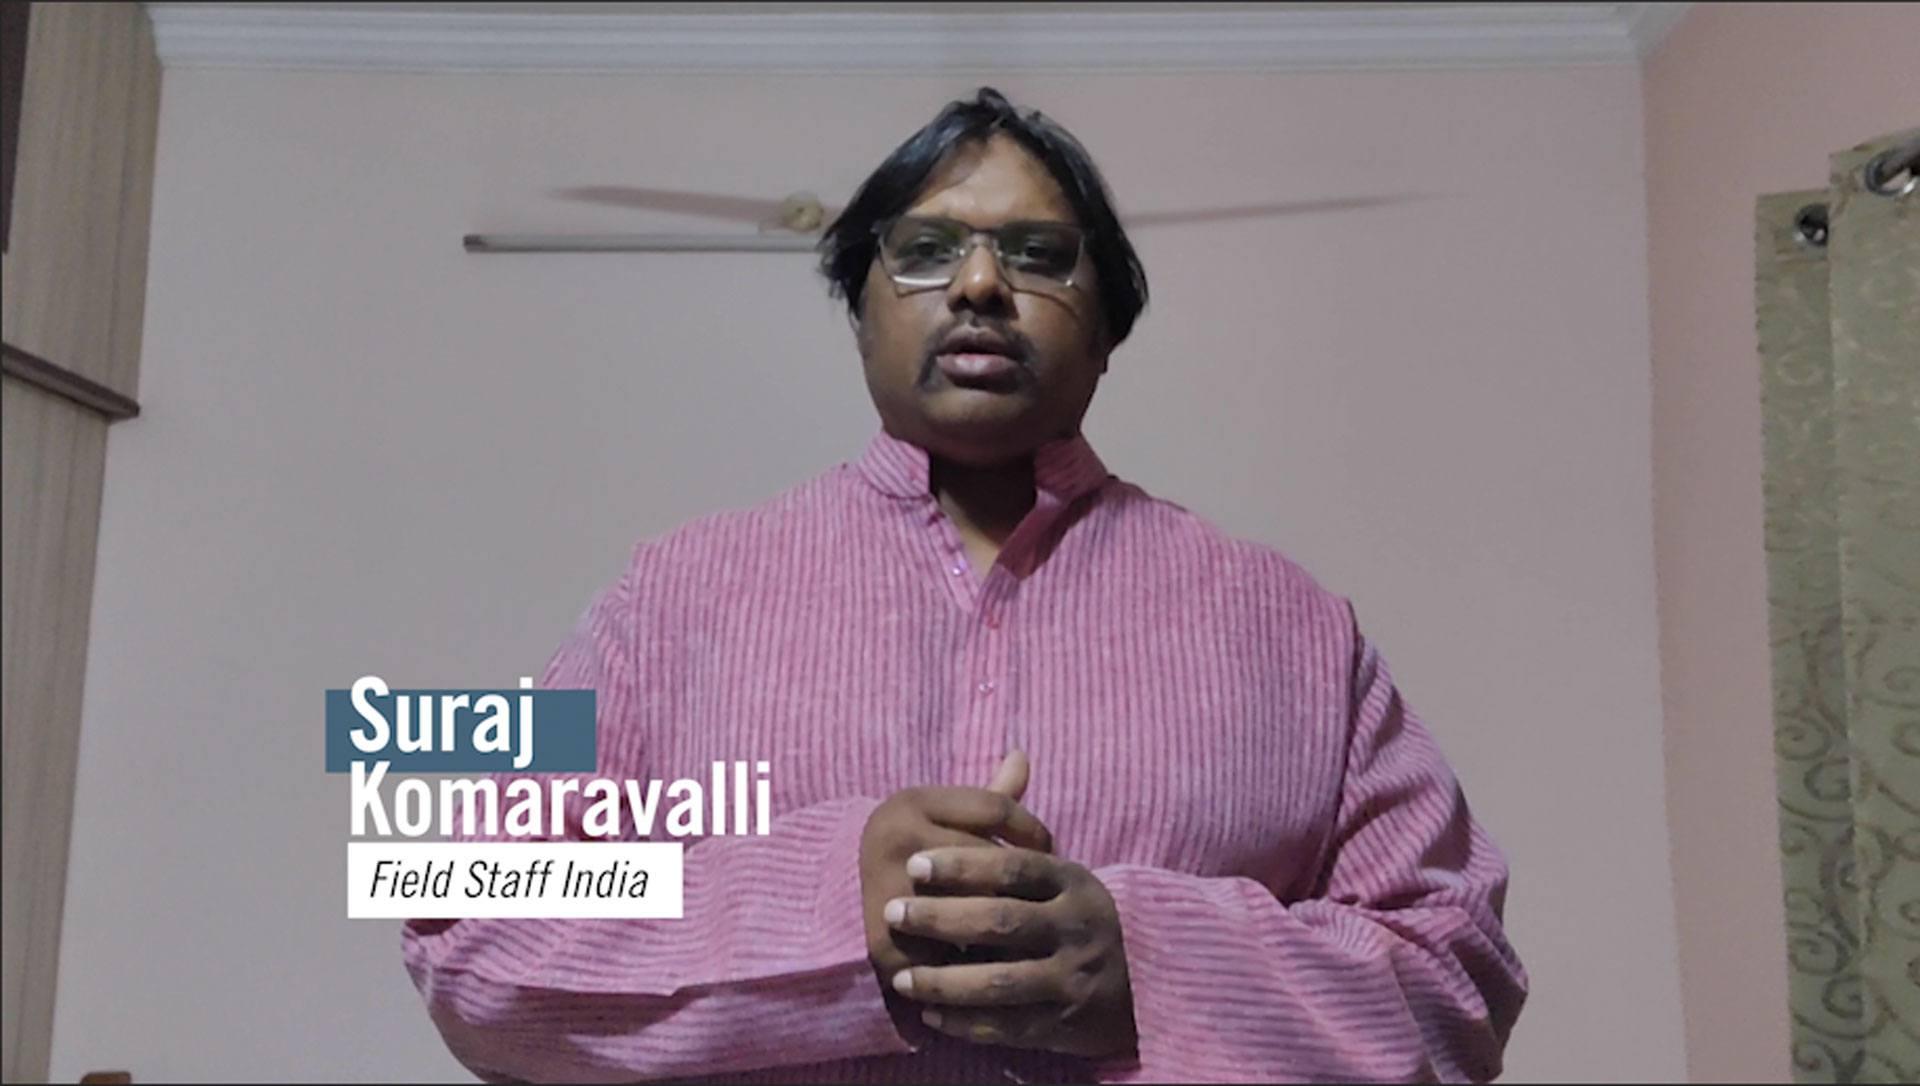 Photo of Suraj Komaravalli's Prayerline video